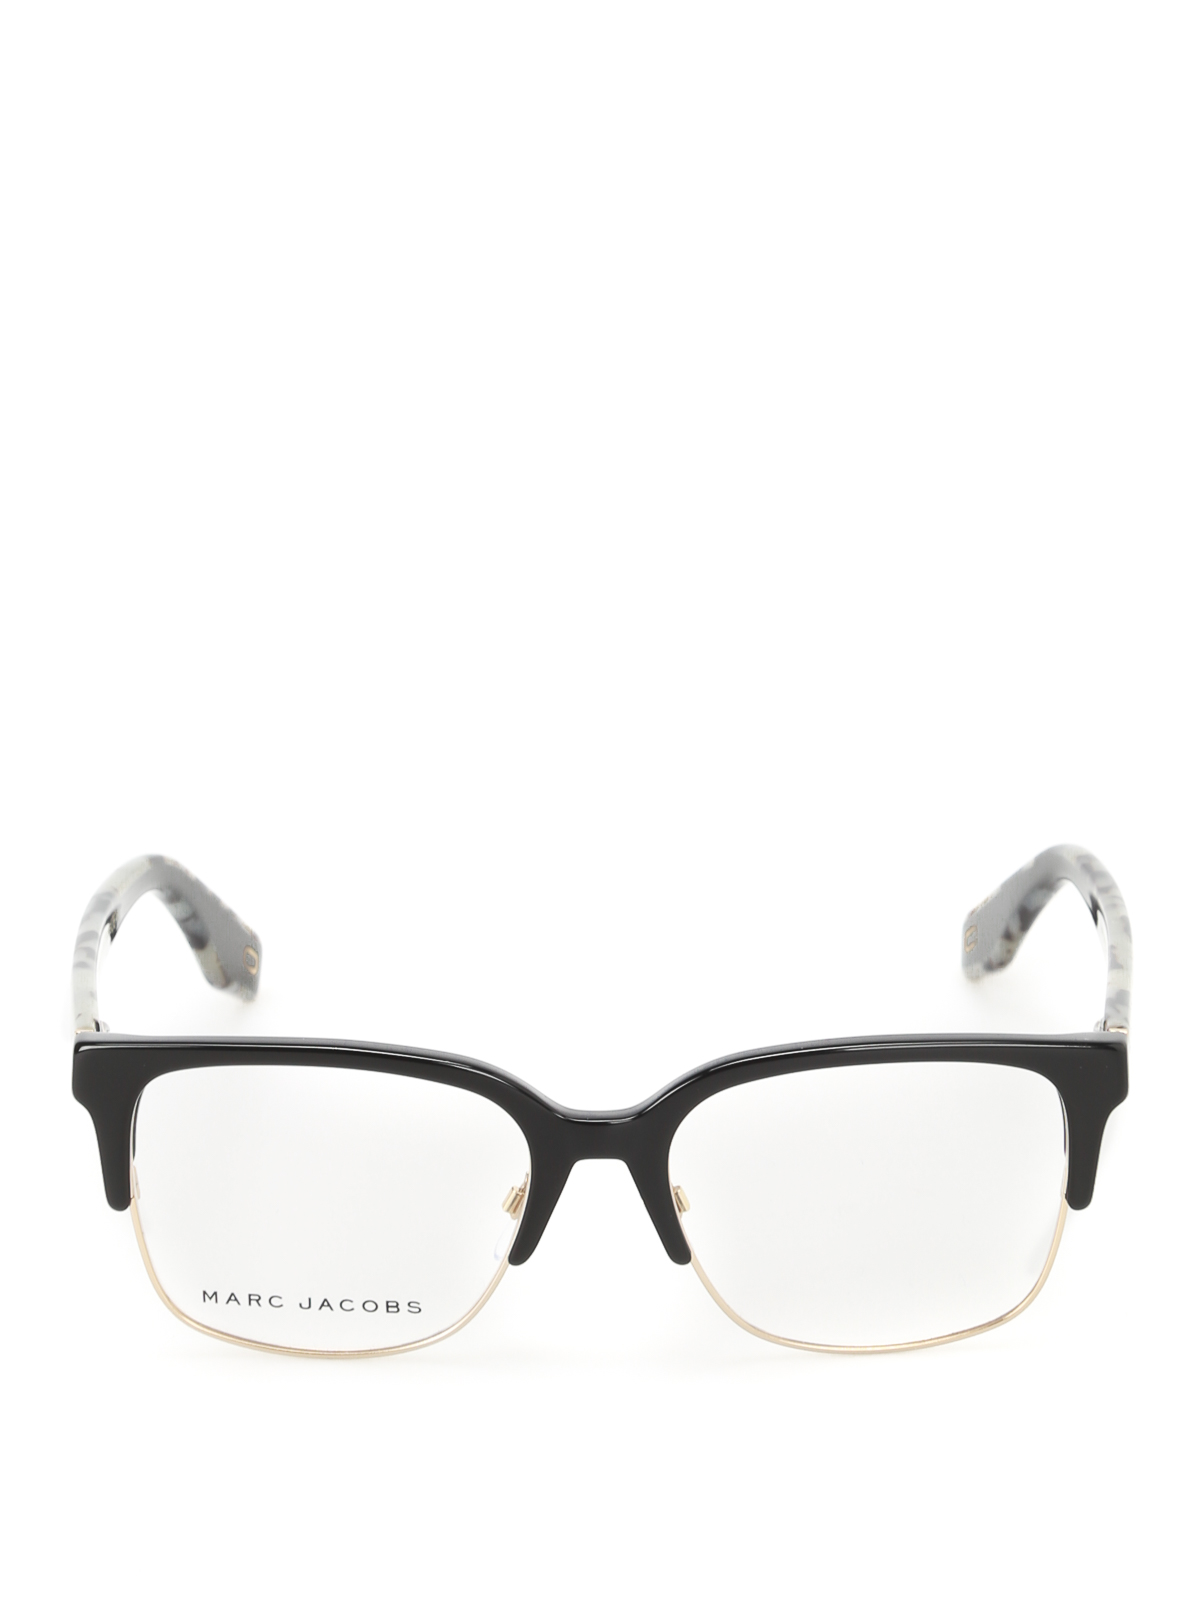 1444fa5fb9f57 Marc Jacobs - Black and gold half frame glasses - glasses - MARC27680717